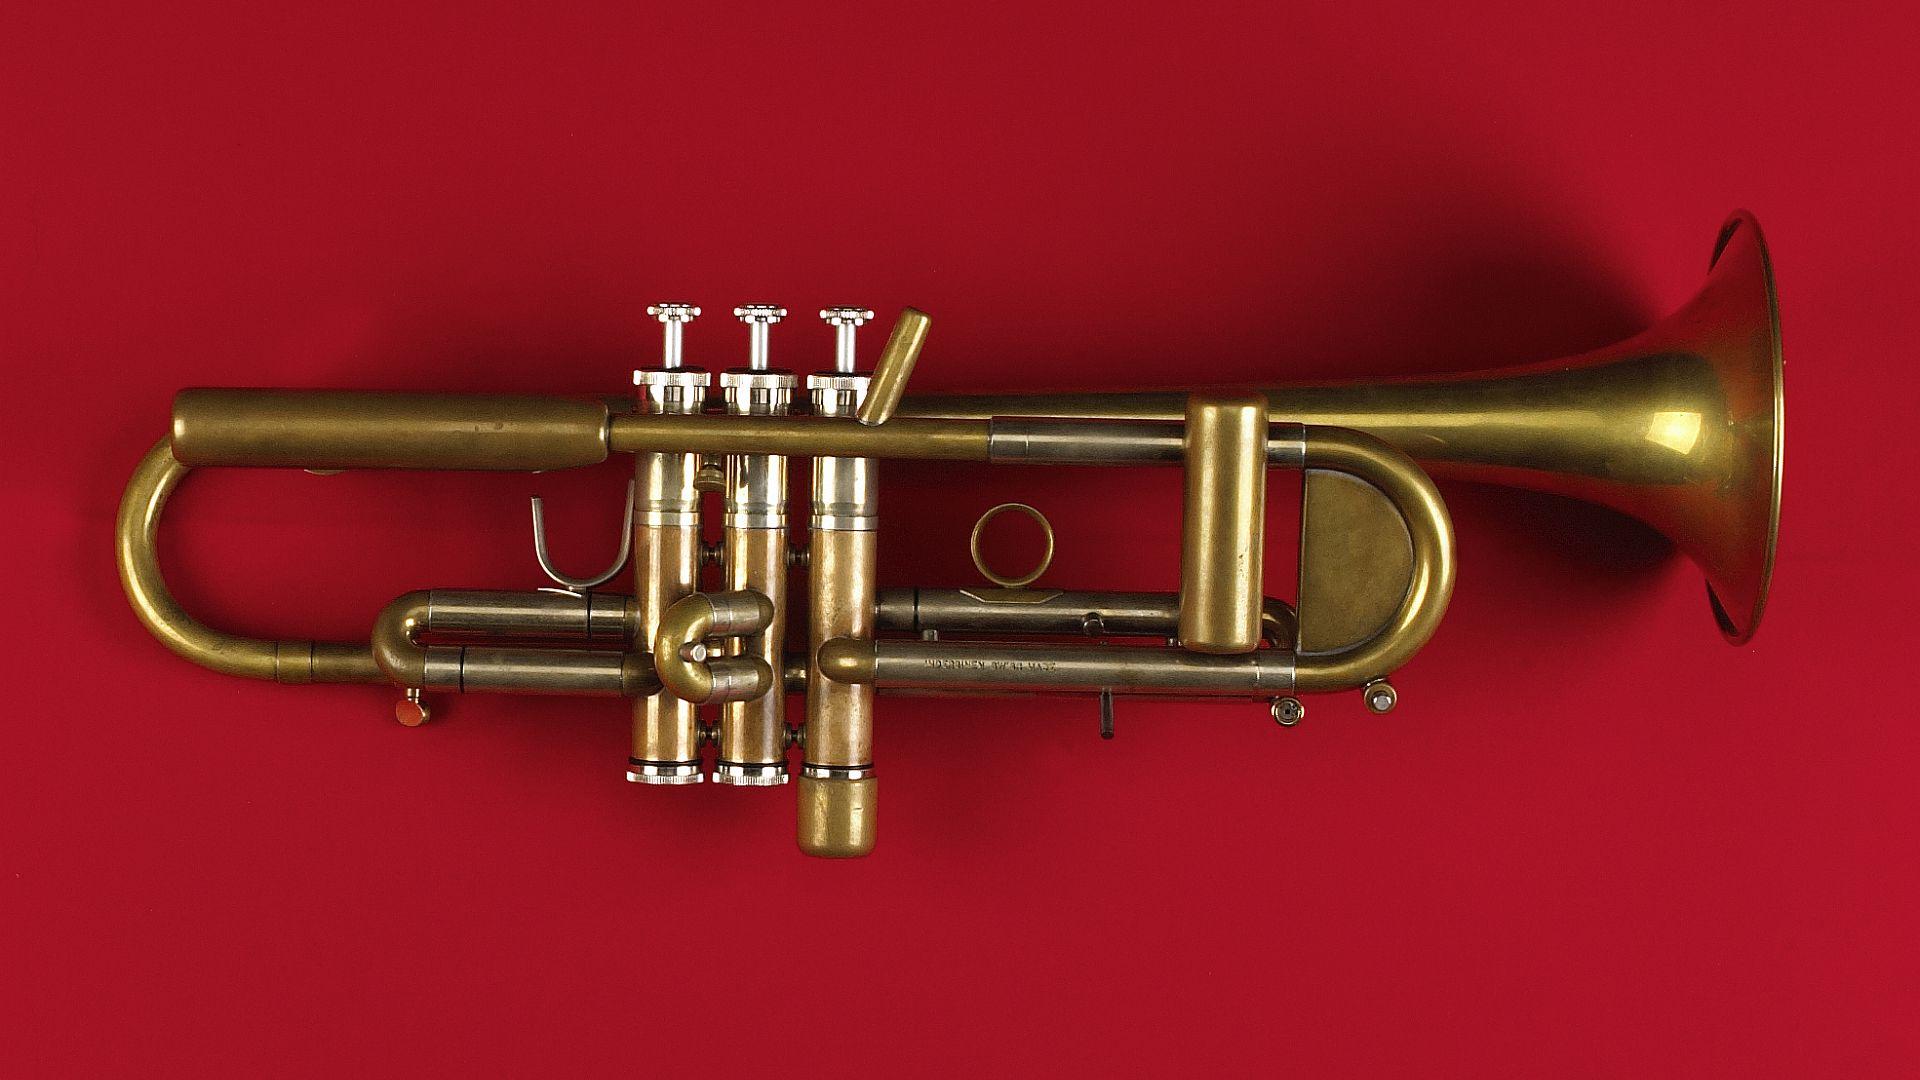 trompete_studie_1920x1080px